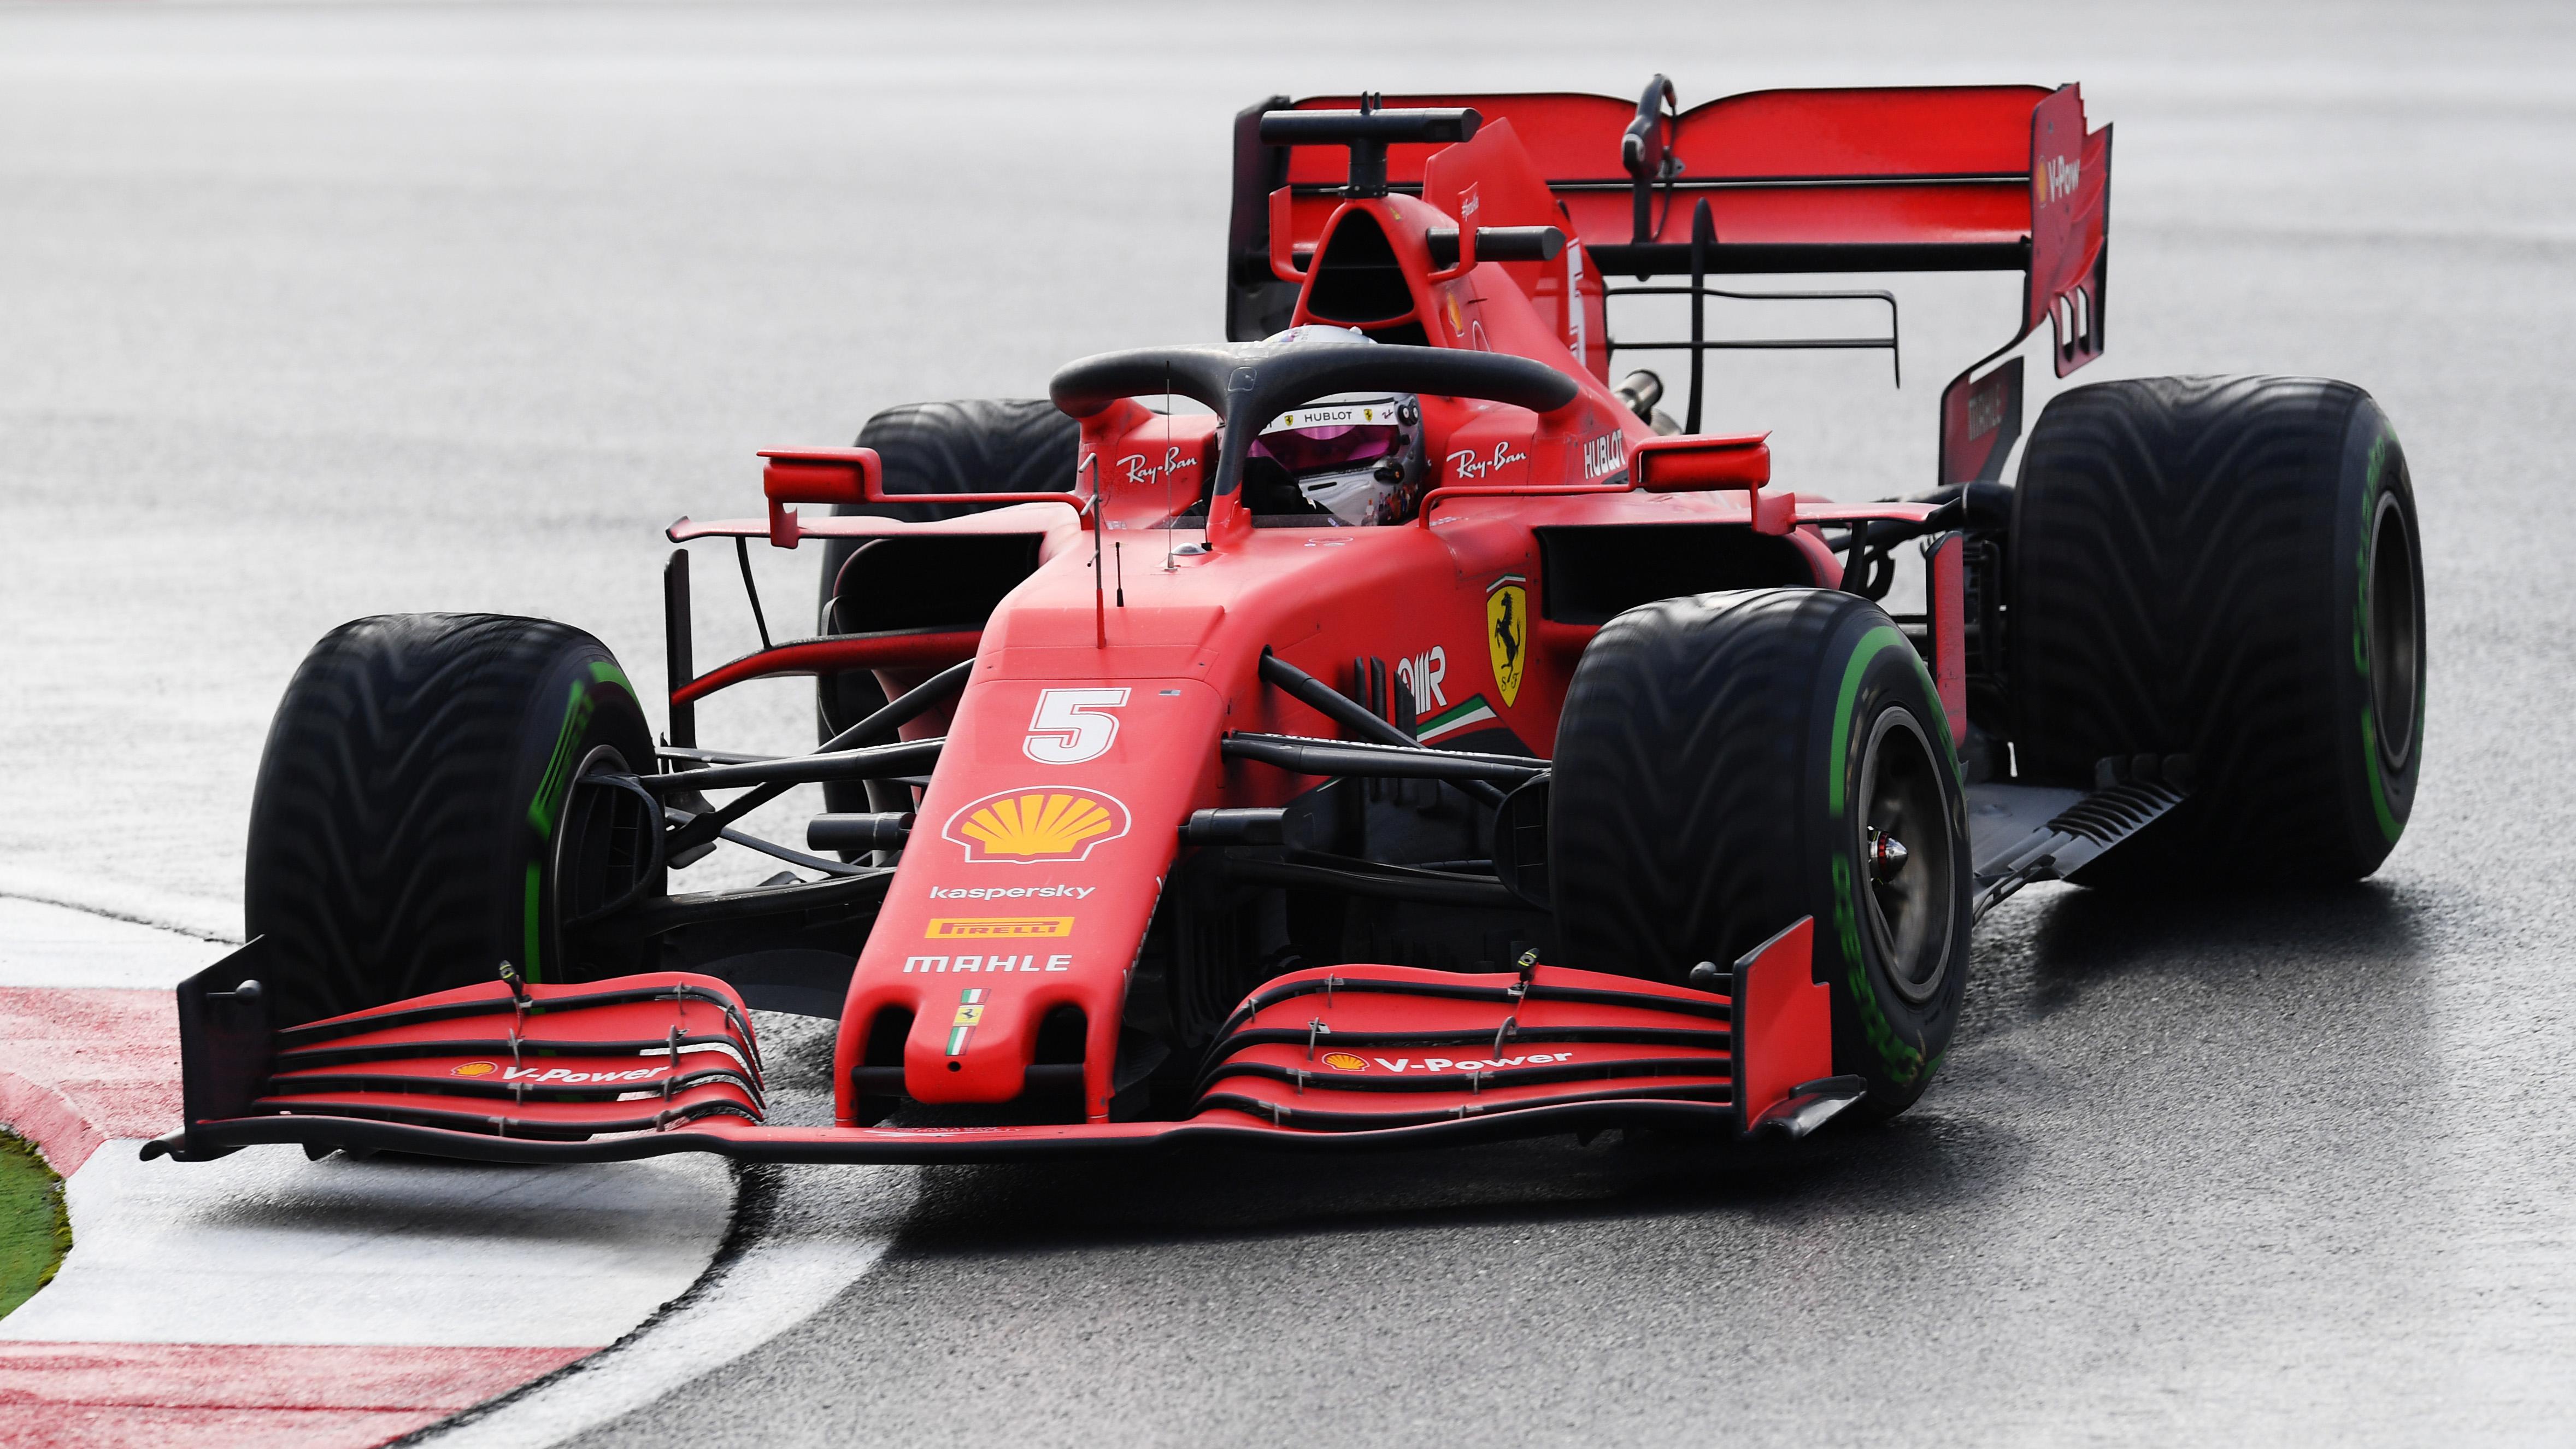 Sebastian Vettel Now Comfortable With Ferrari Sf1000 After Difficult Season Says Binotto Formula 1